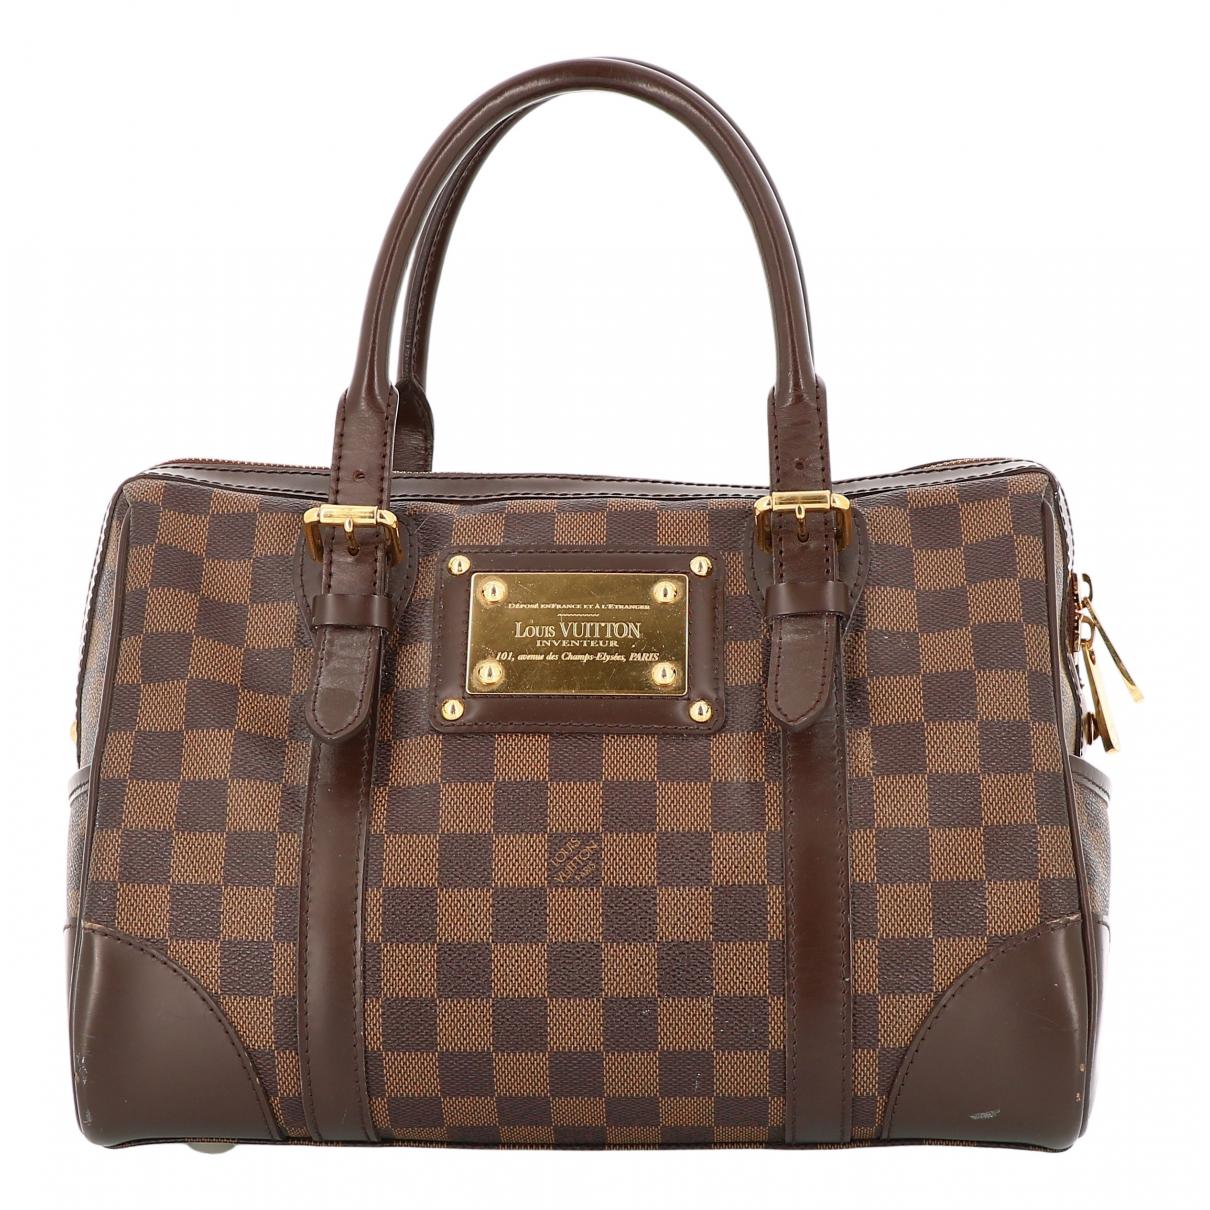 Louis Vuitton - Sac a main Berkeley pour femme en toile - marron